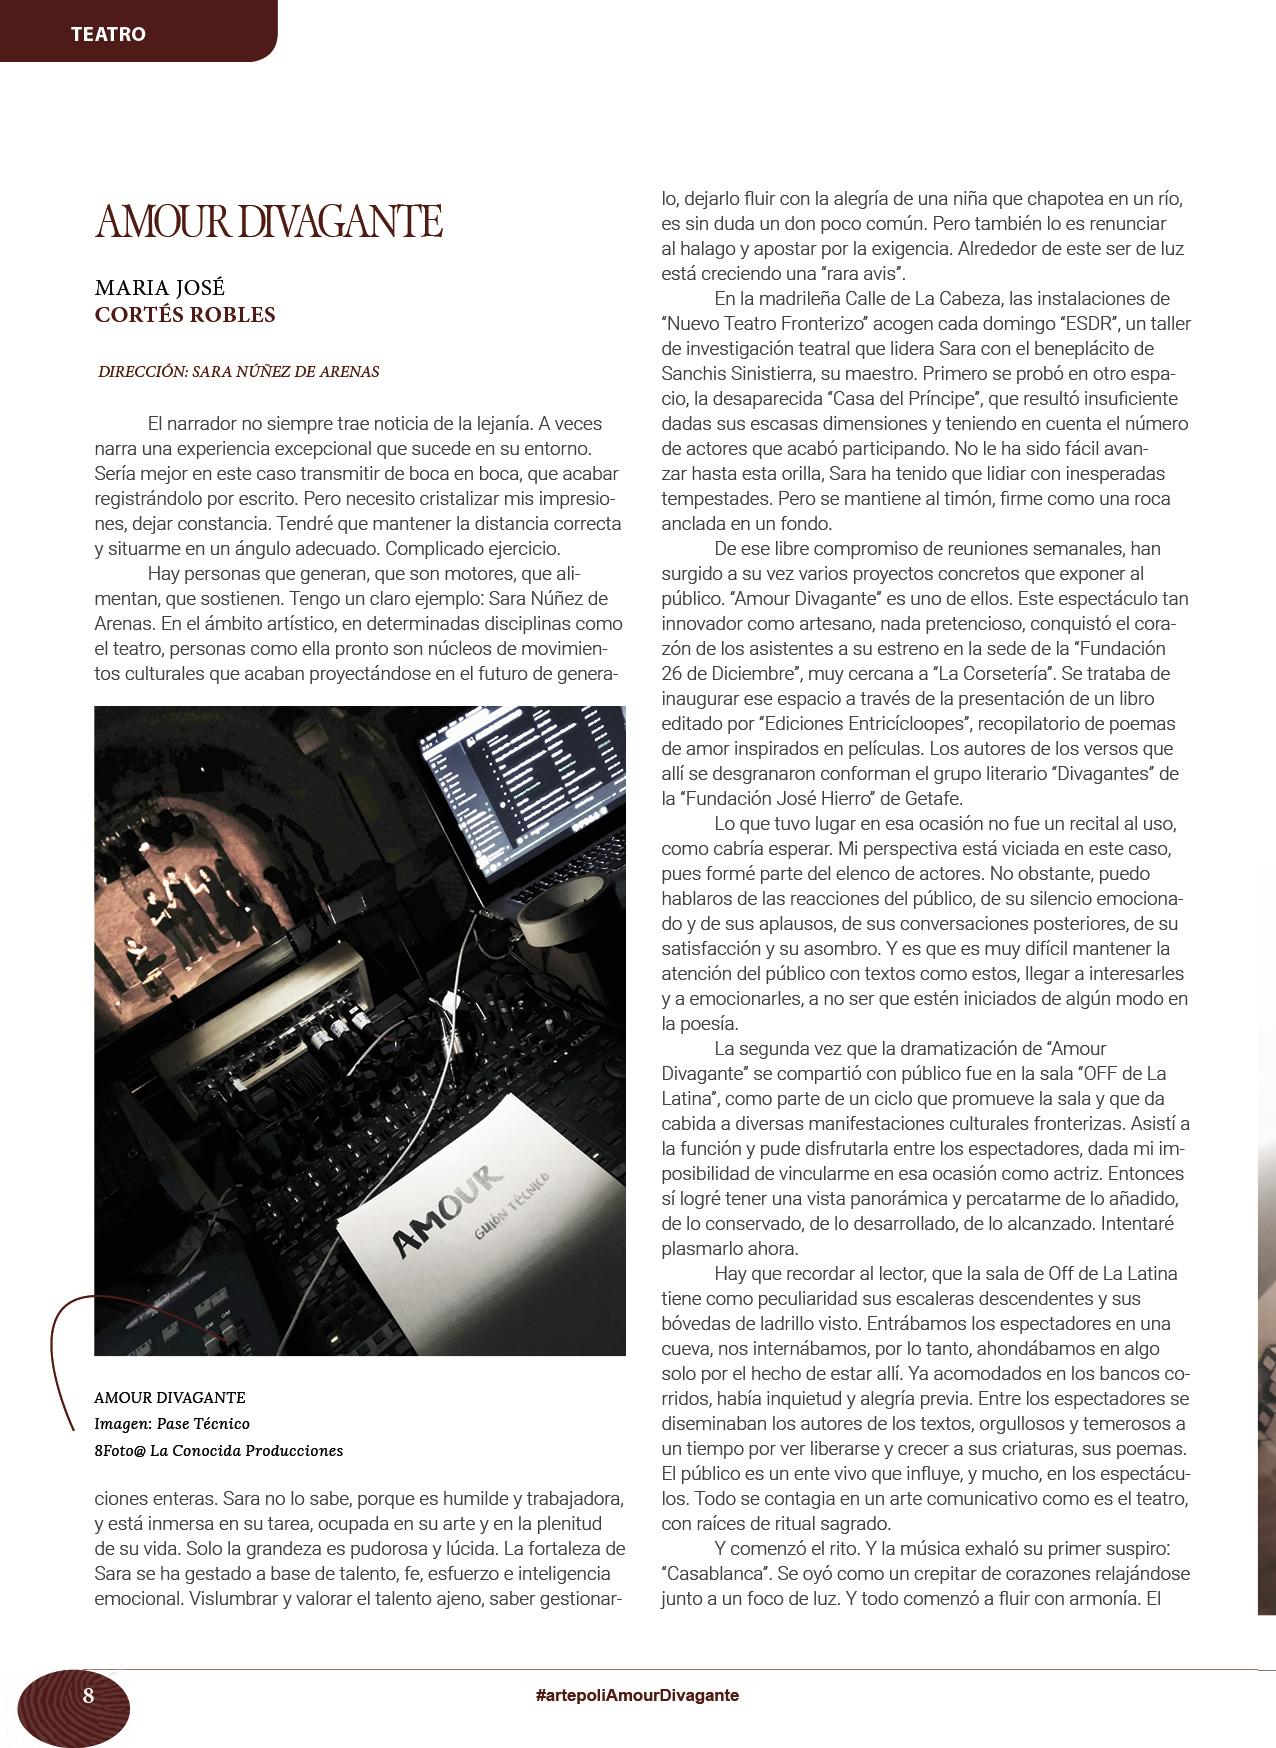 Revista Artepoli Amour divagante DIRECCIÓN: SARA NÚÑEZ DE ARENAS María José Cortés Robles